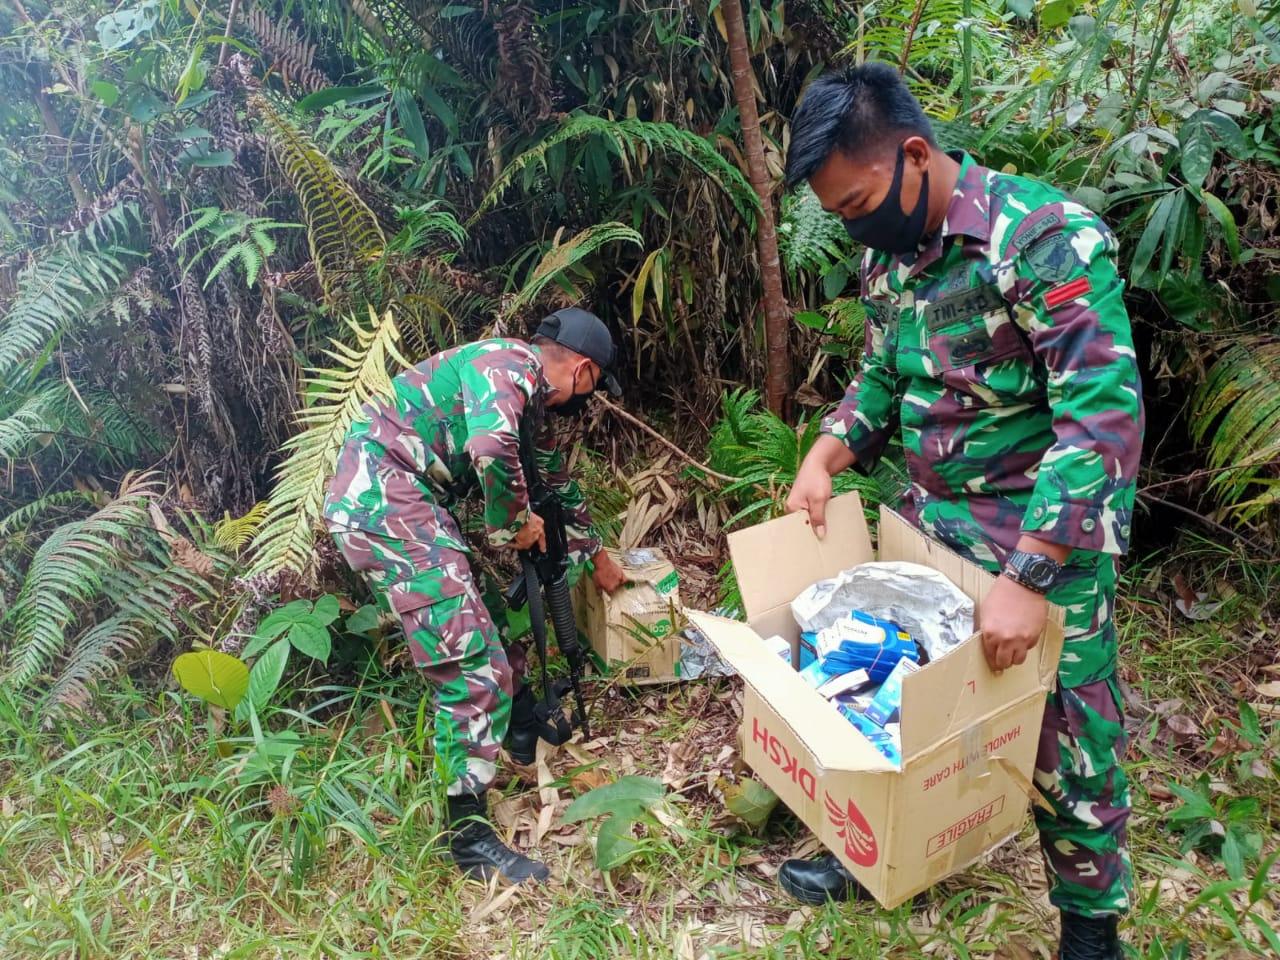 Puluhan Jenis Obat-Obatan Ilegal Diamankan Satgas Pamtas RI-Malaysia Di Jalan Tikus